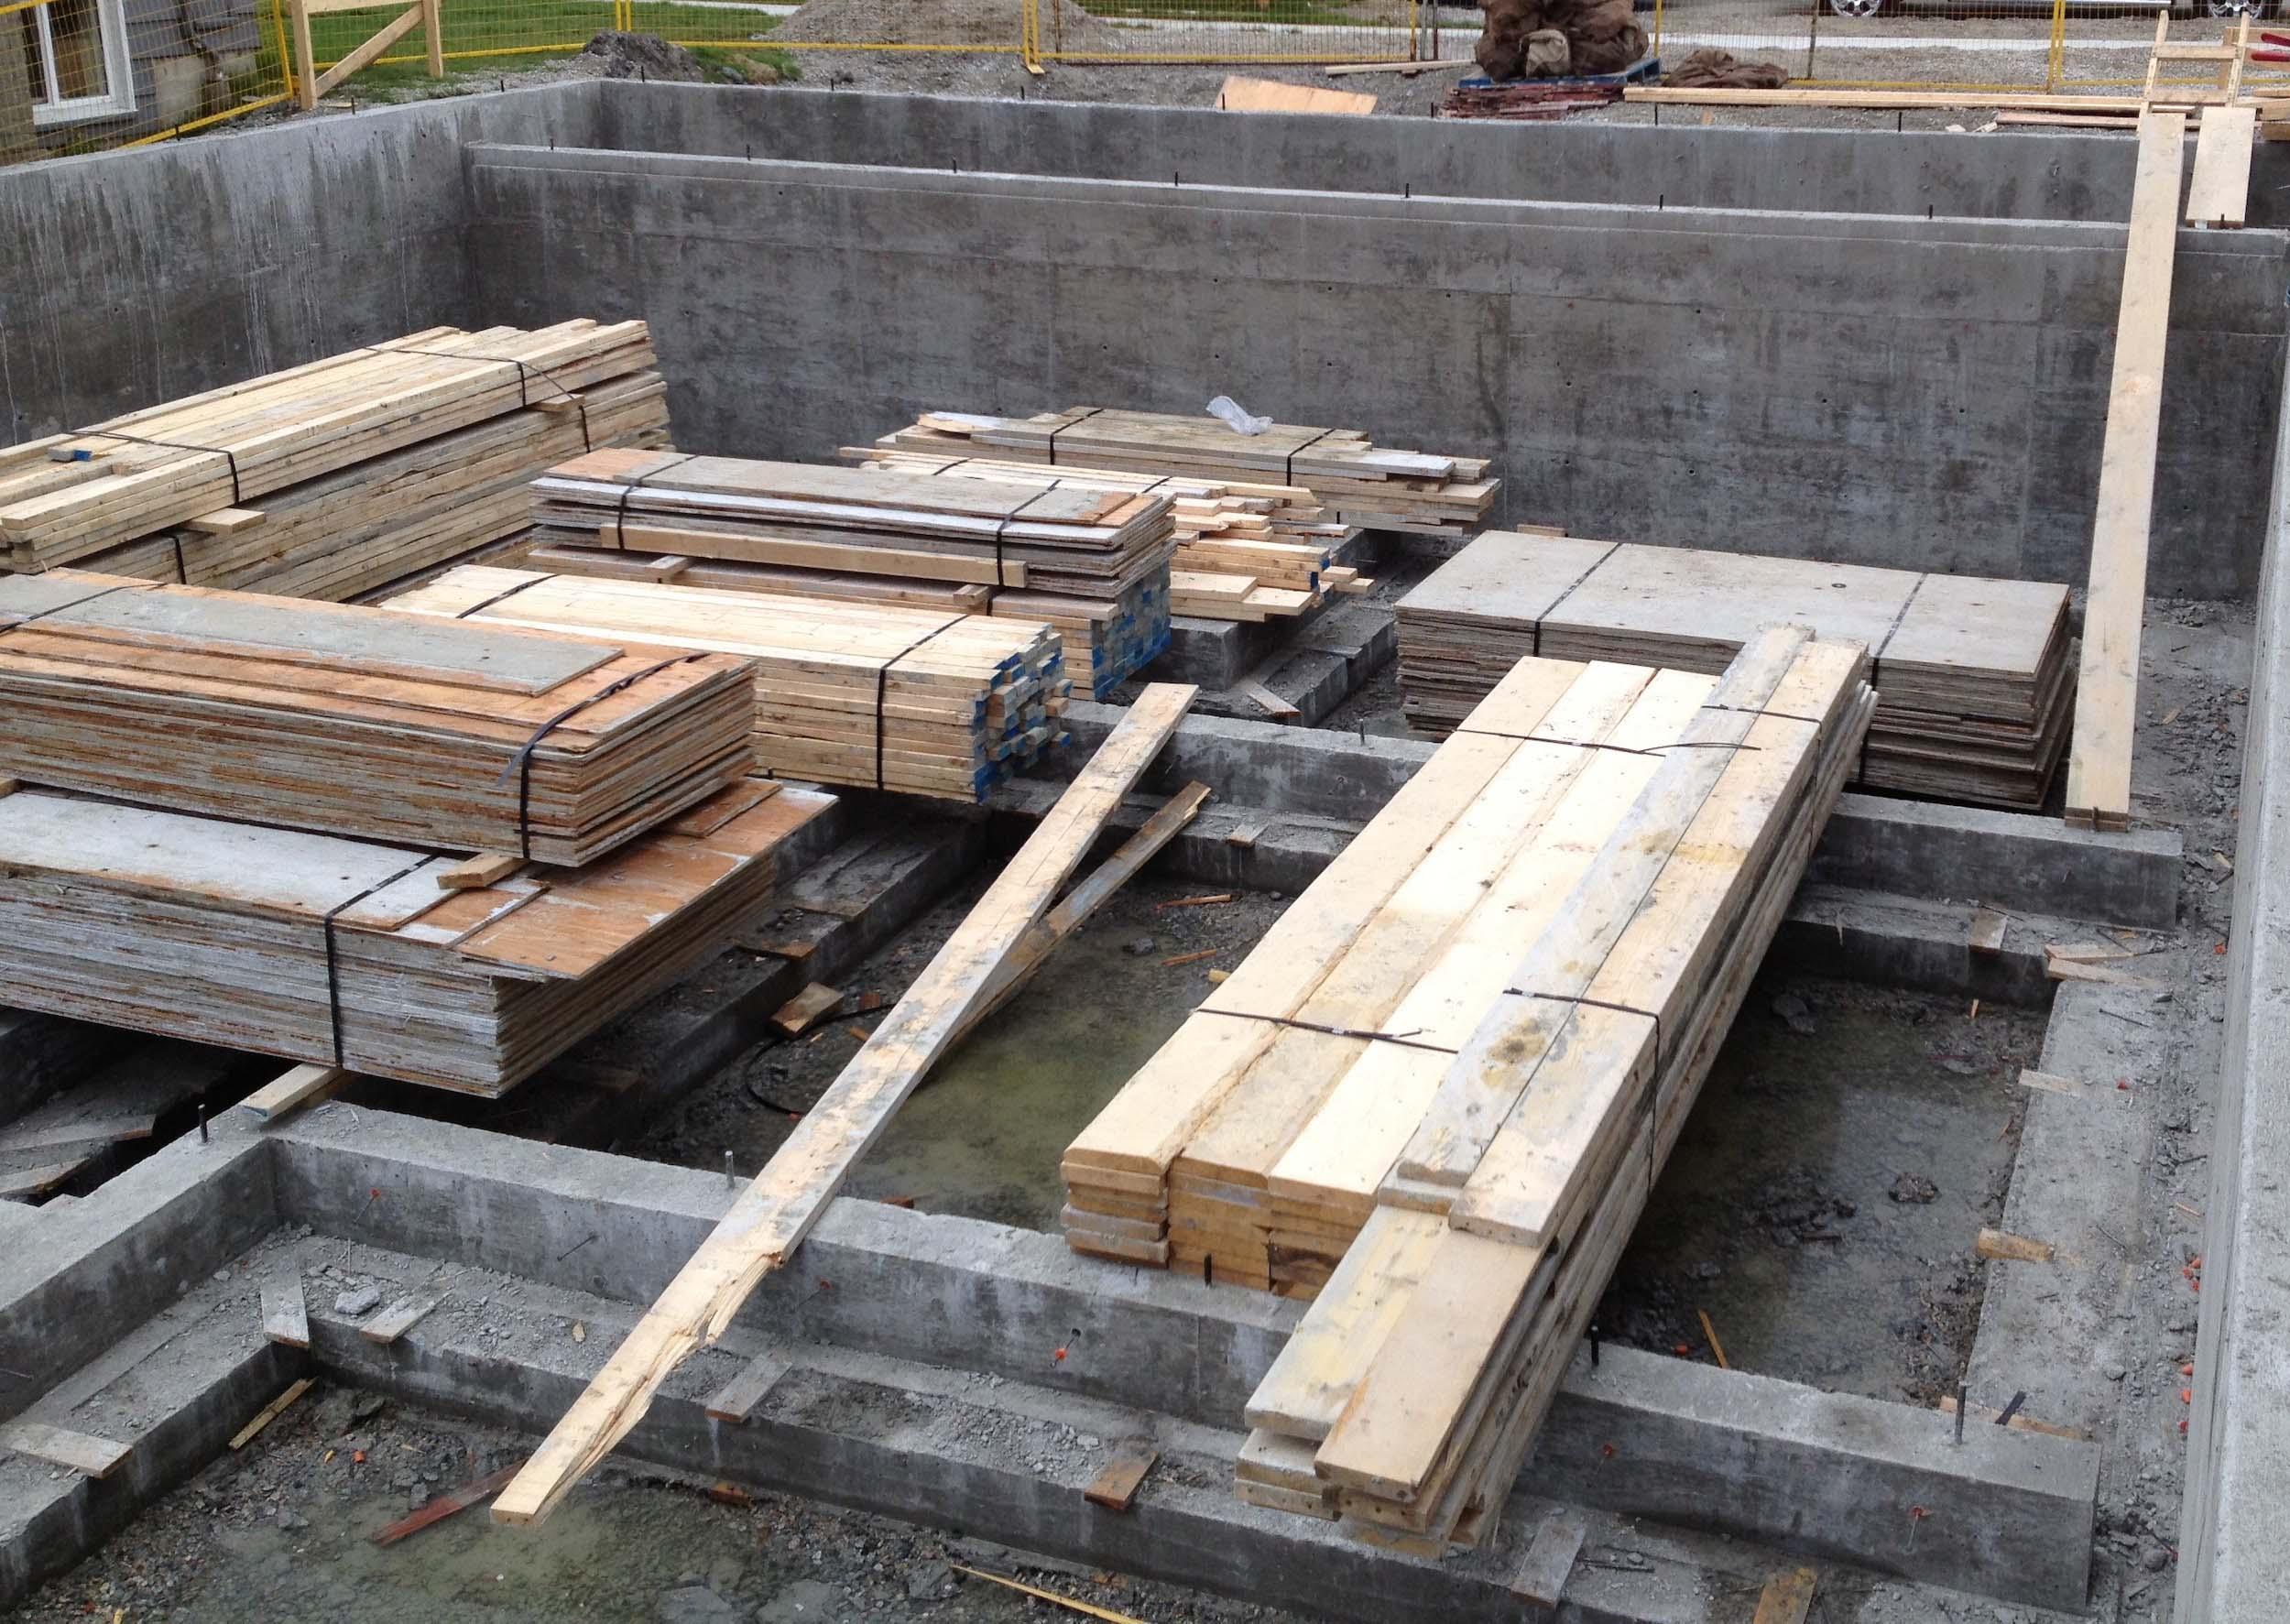 Postle_Construction_ConcreteForming7.jpg